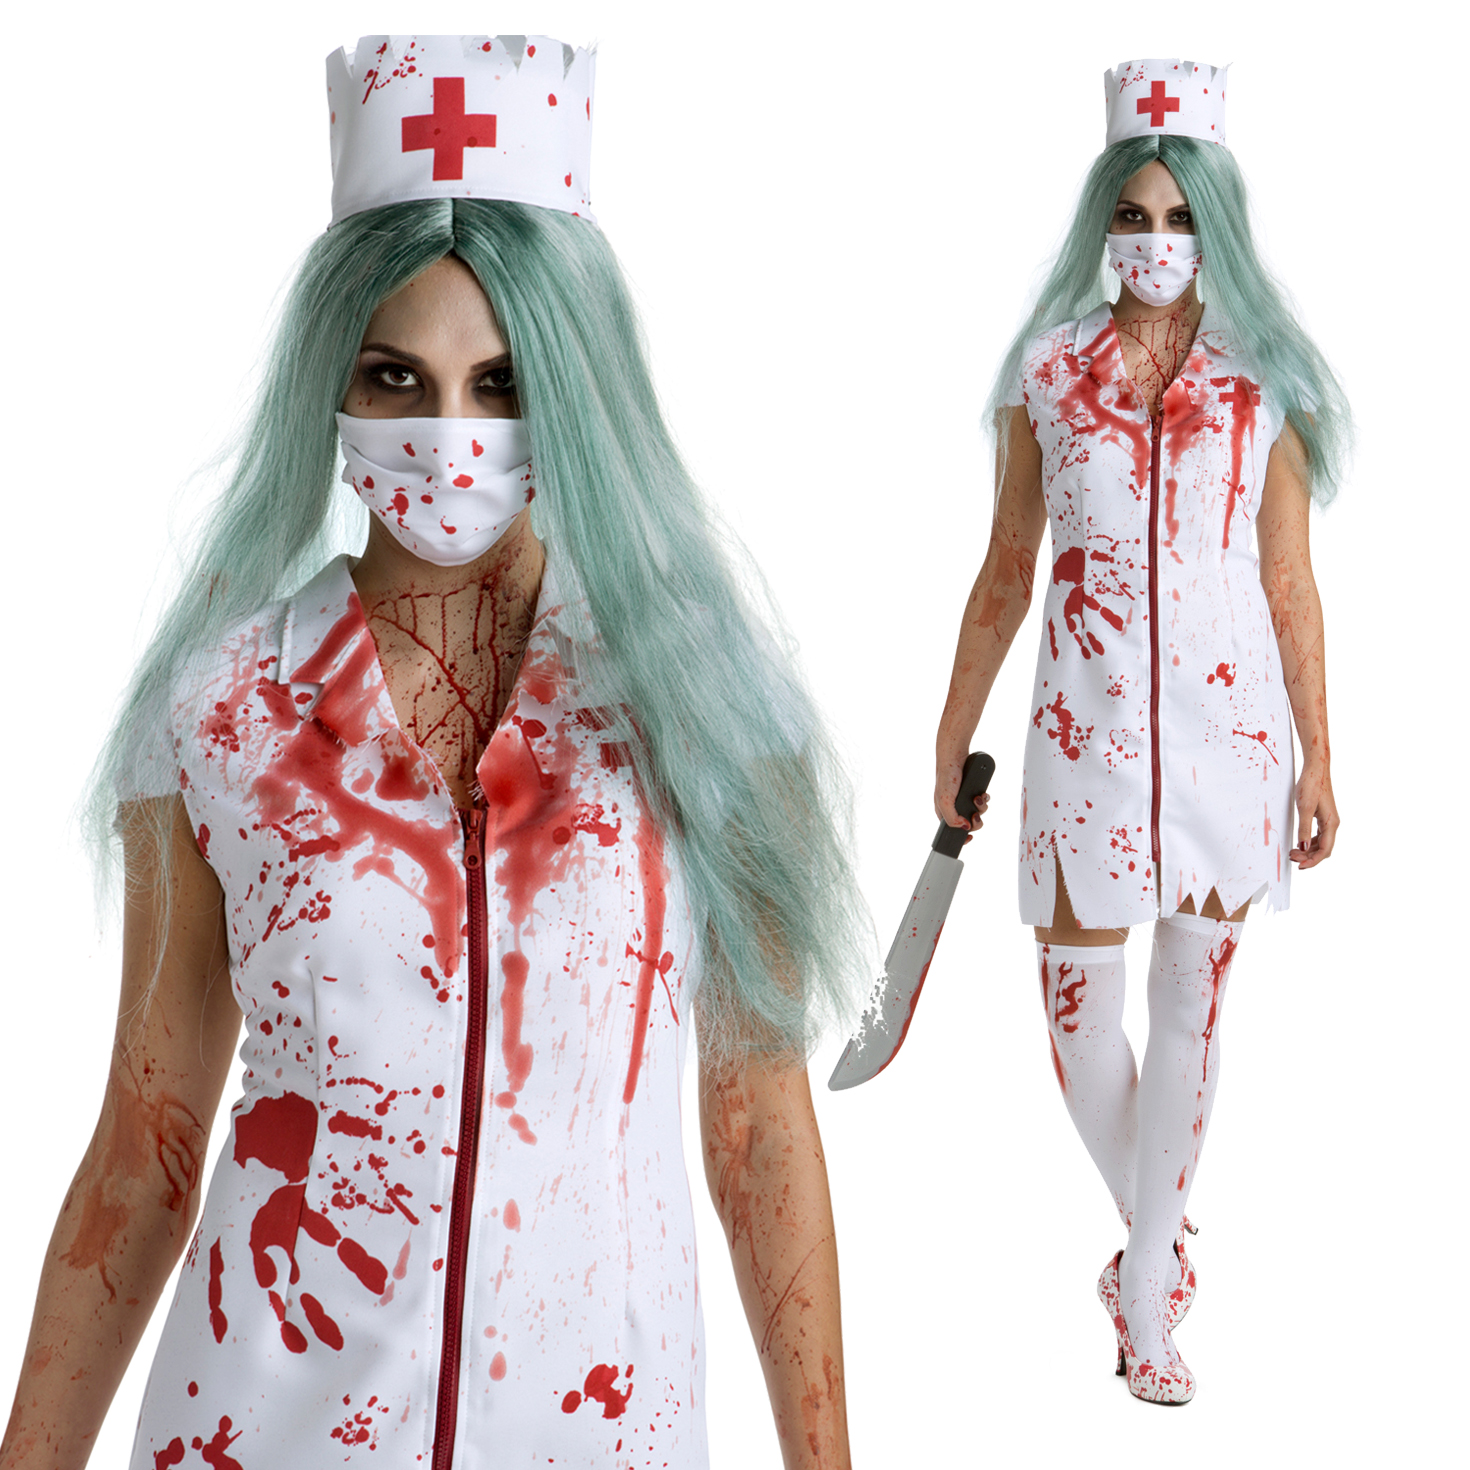 Halloween Party Bloody Nurse Costume Scary Zombie Fancy Dress Cap Mask Uniform